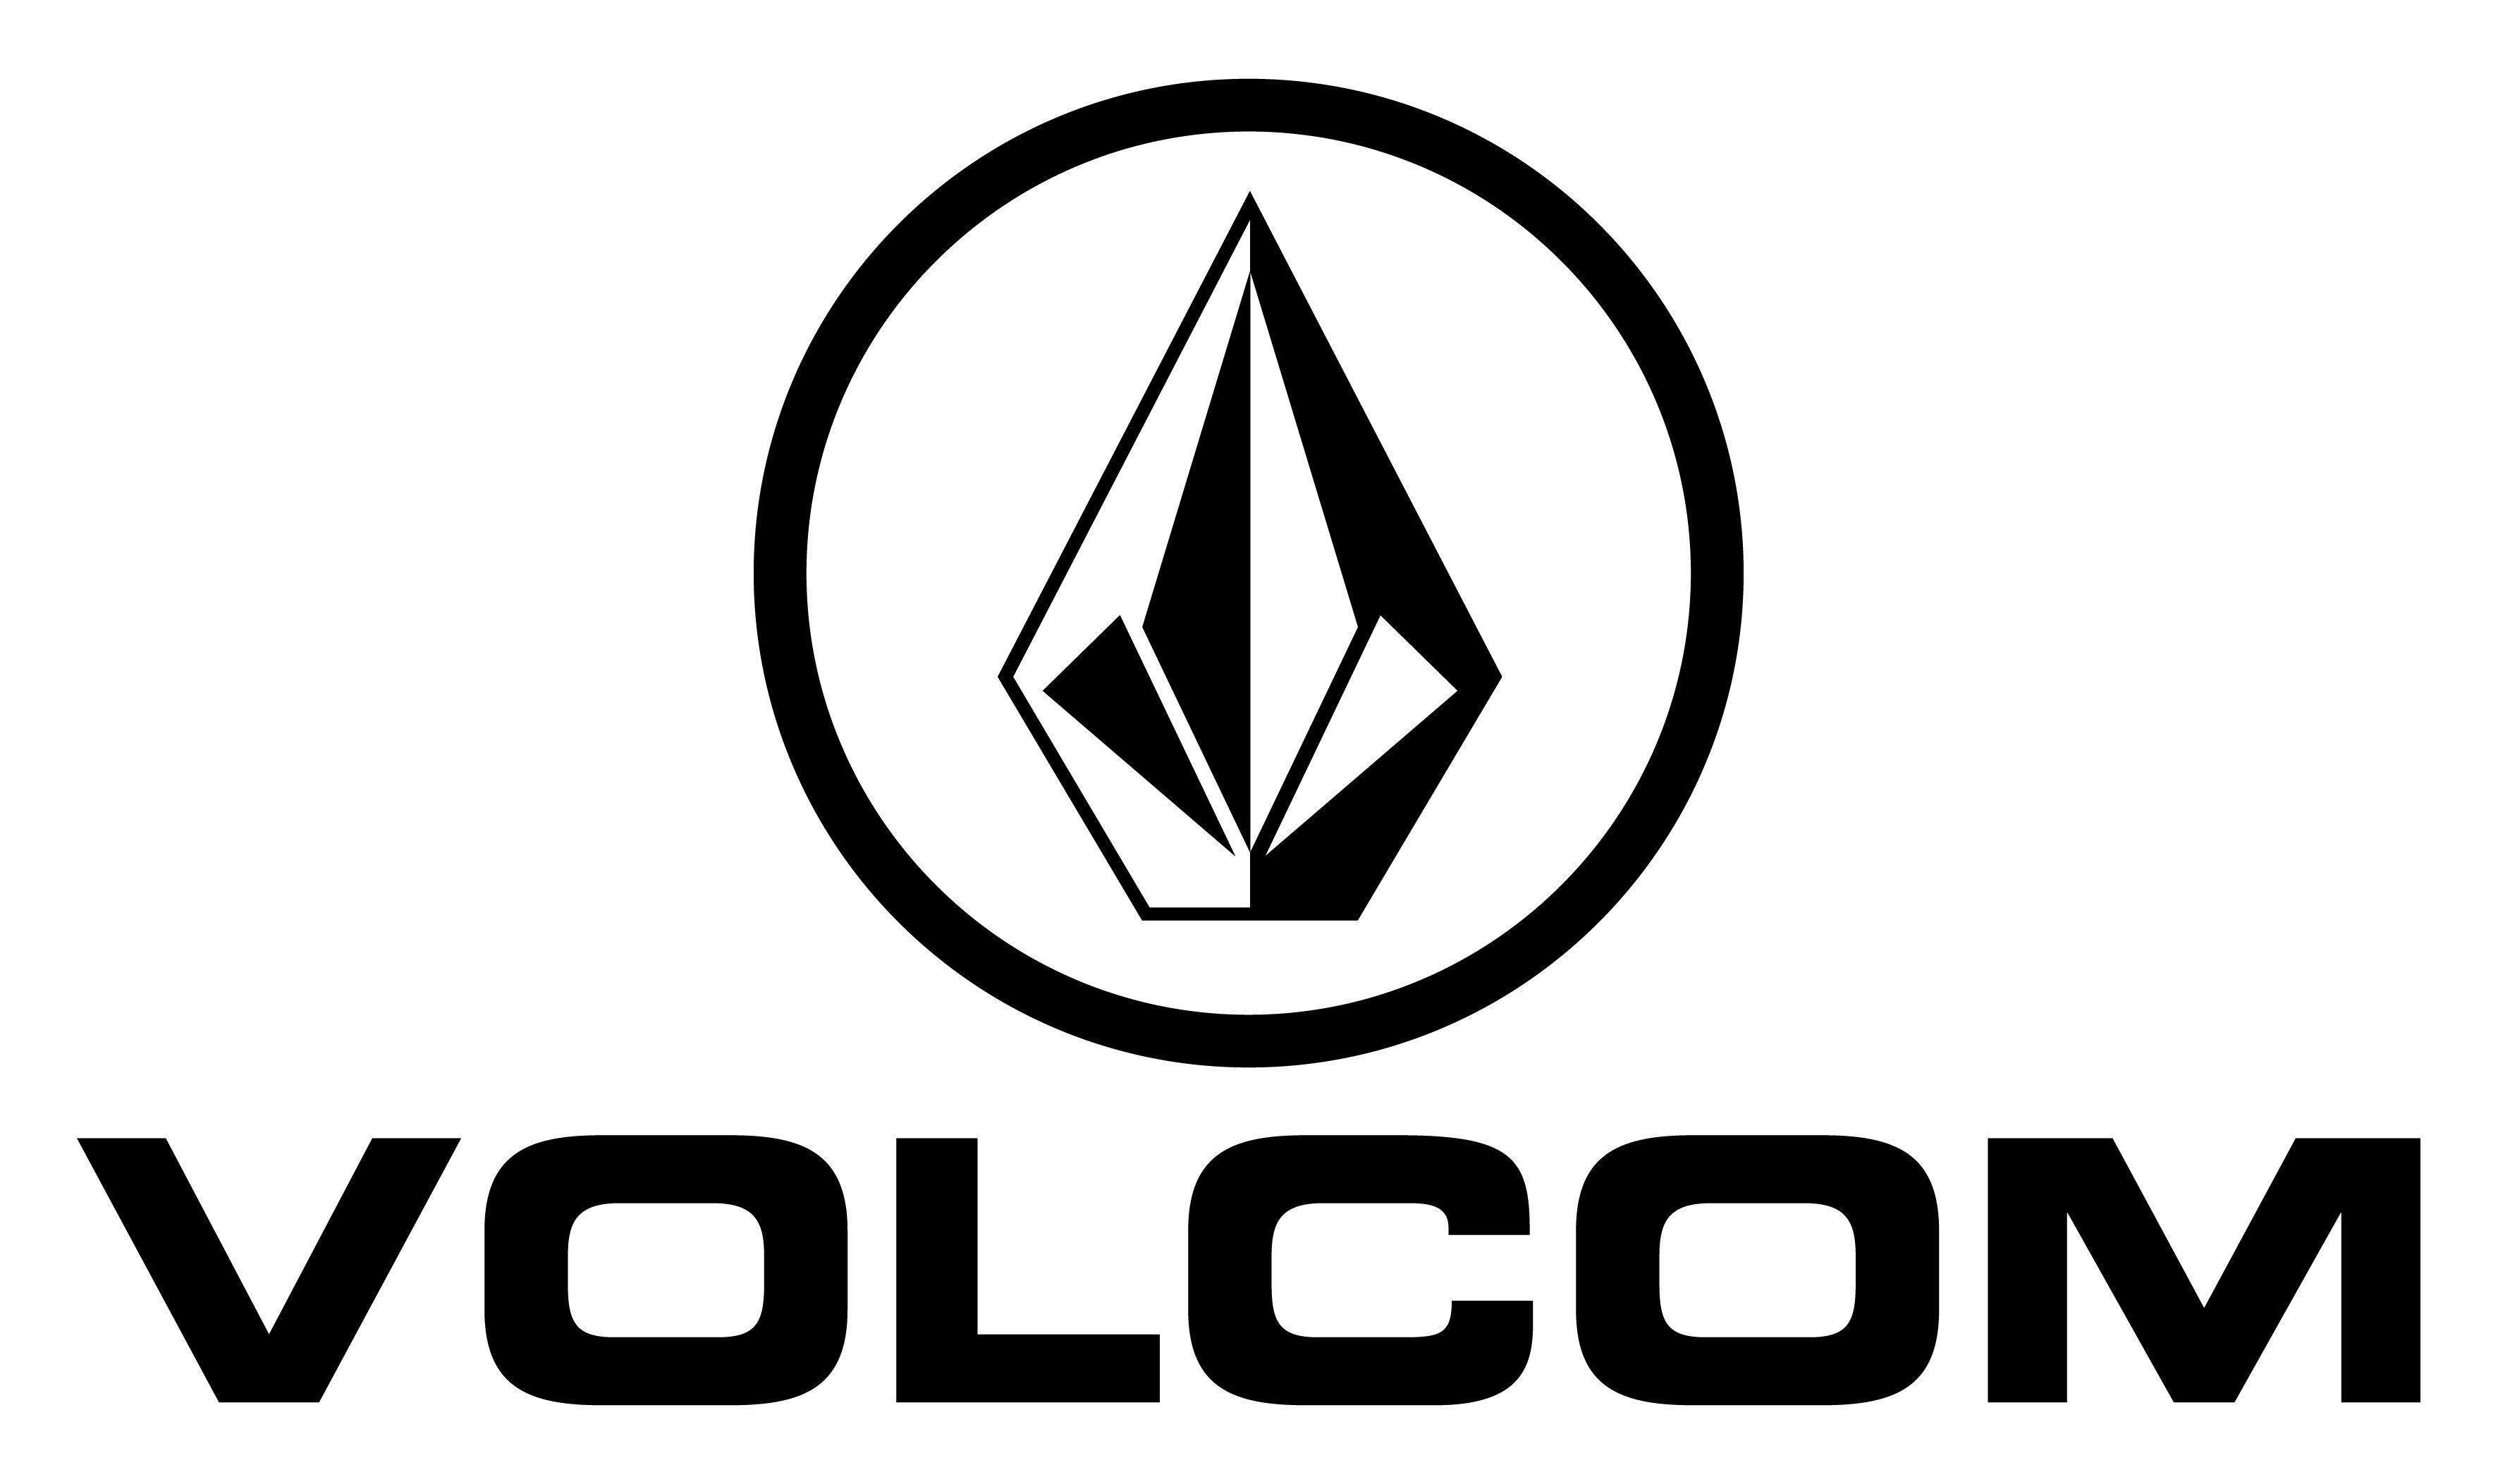 volcom logo wallpaper 43 images